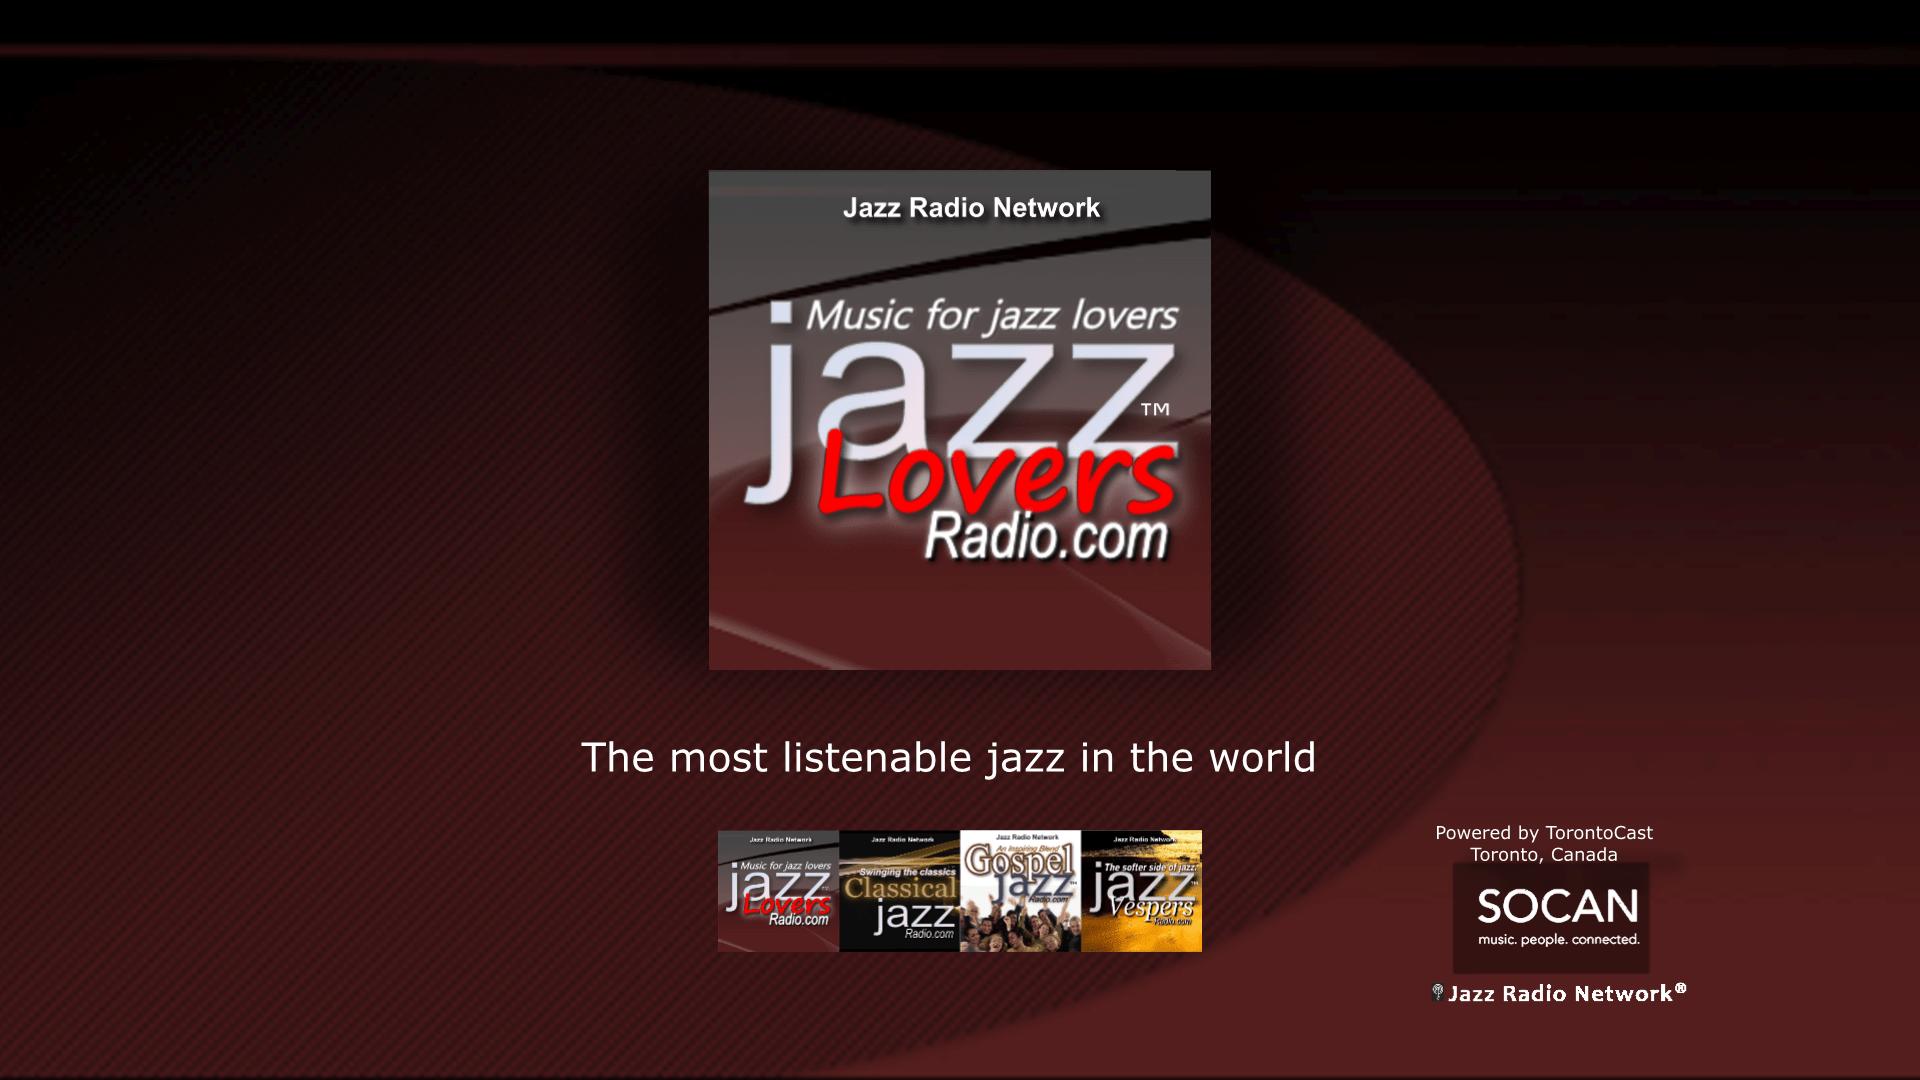 A service of Jazz Radiio Network